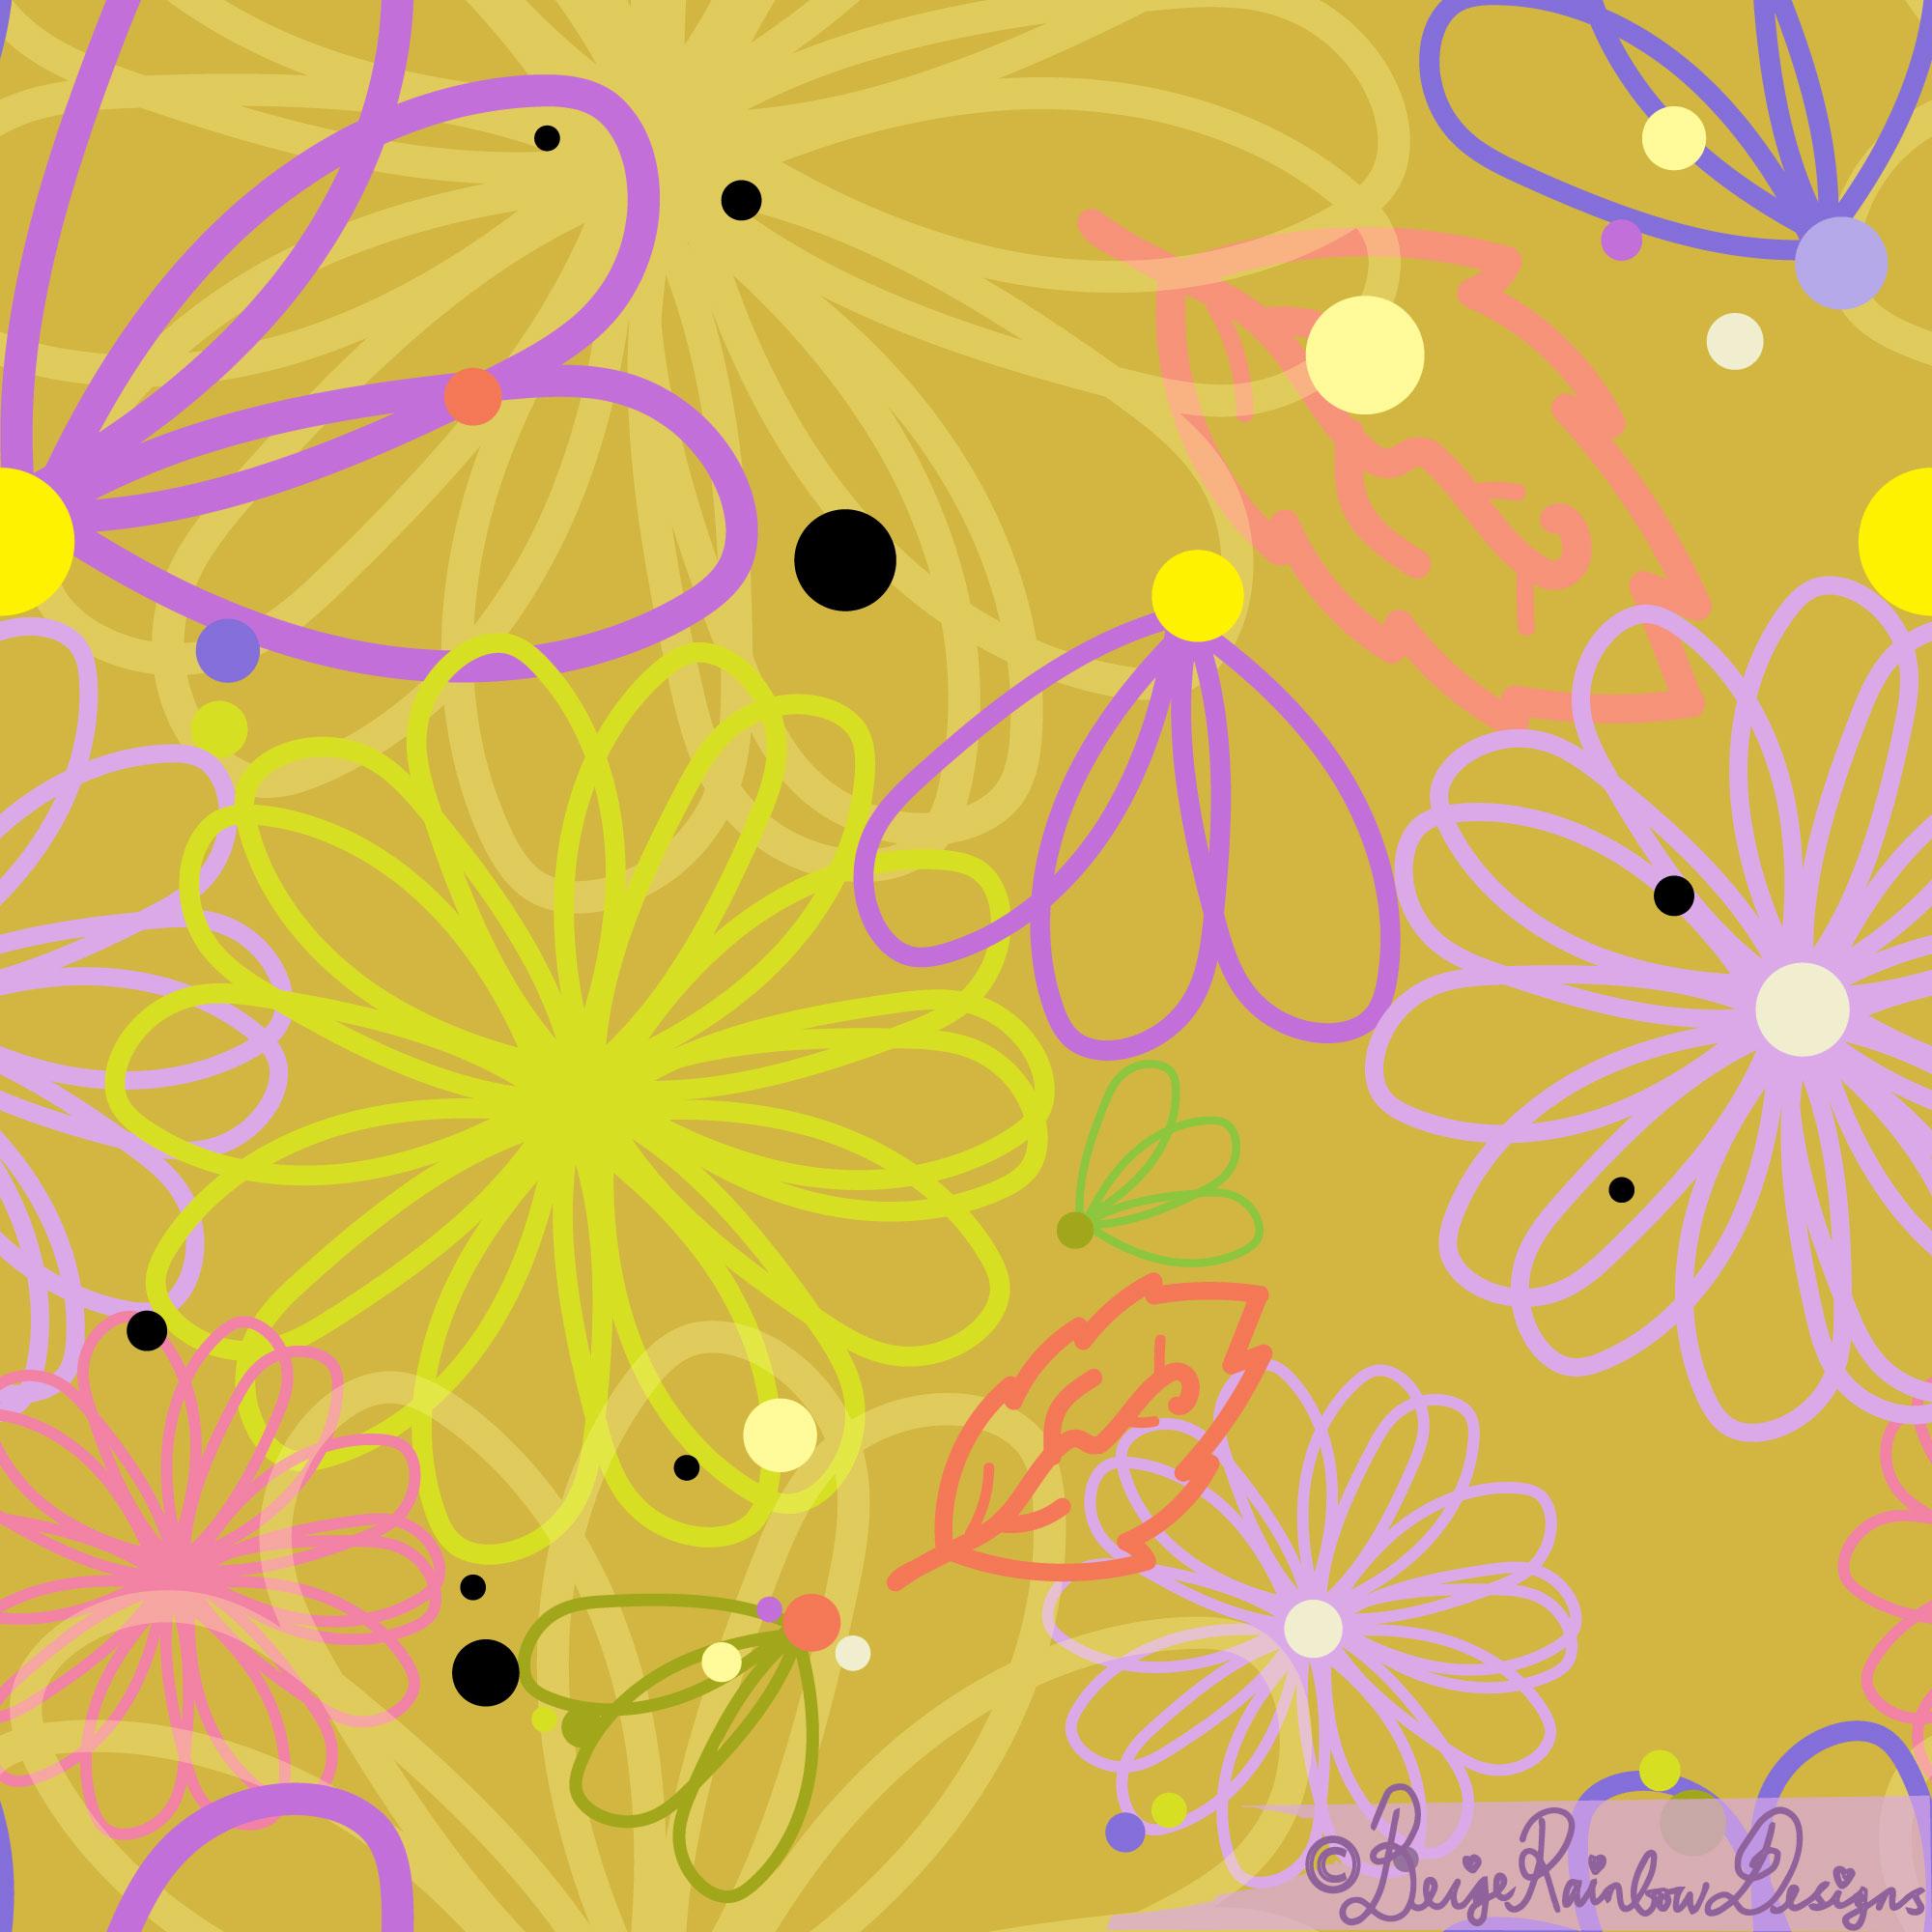 Flowers-31st-March-for-webby.jpg